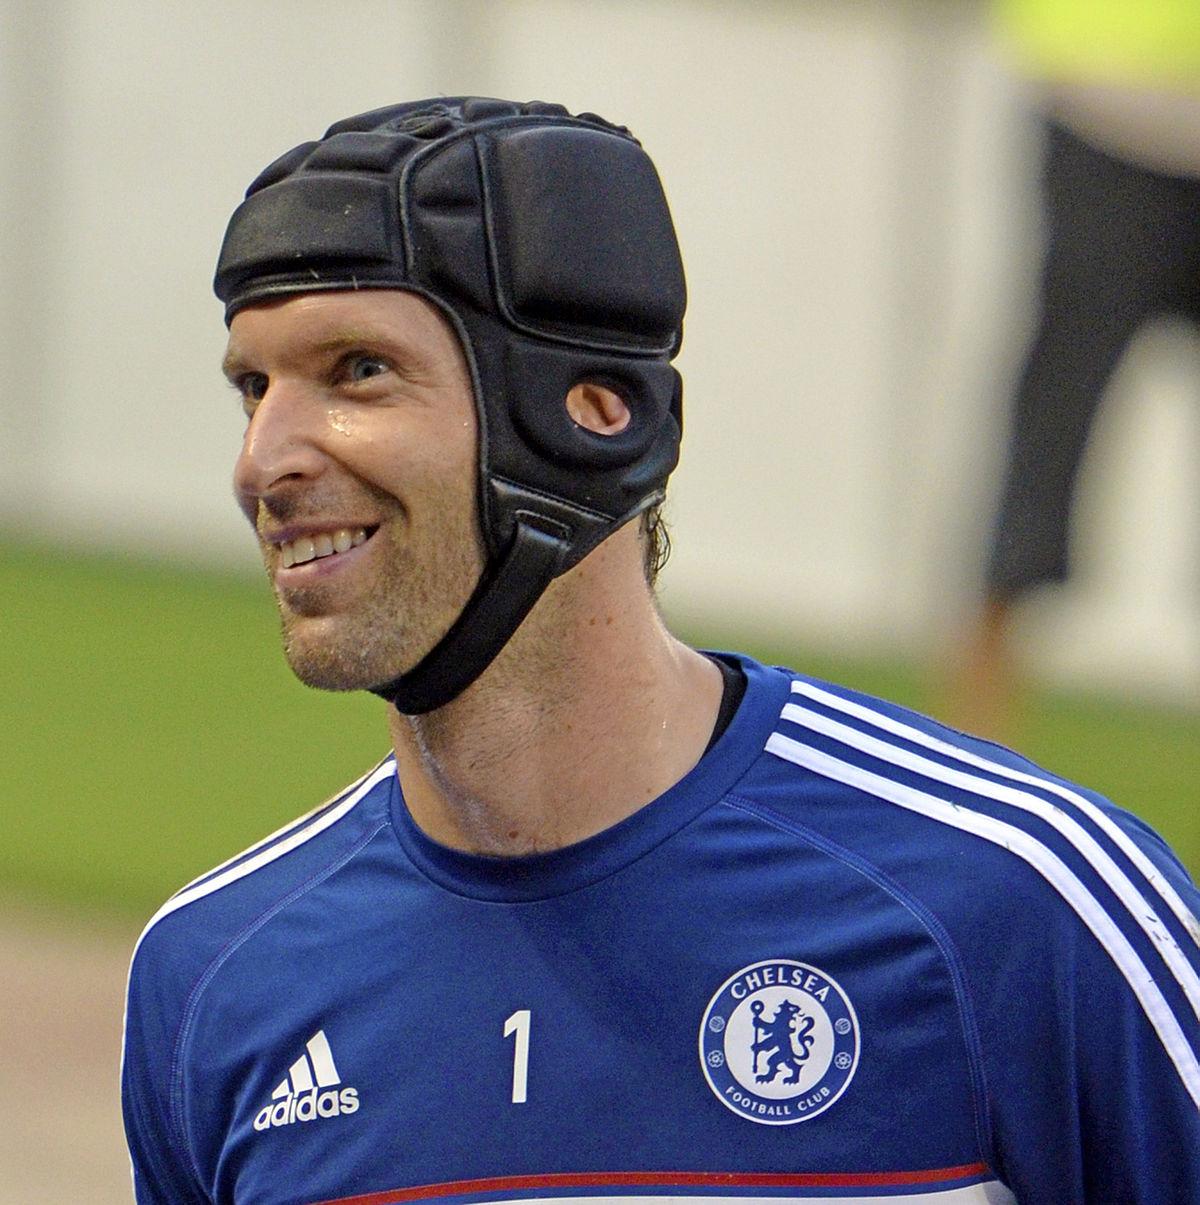 De director deportivo a portero ¡Peter Cech regresa del retiro!